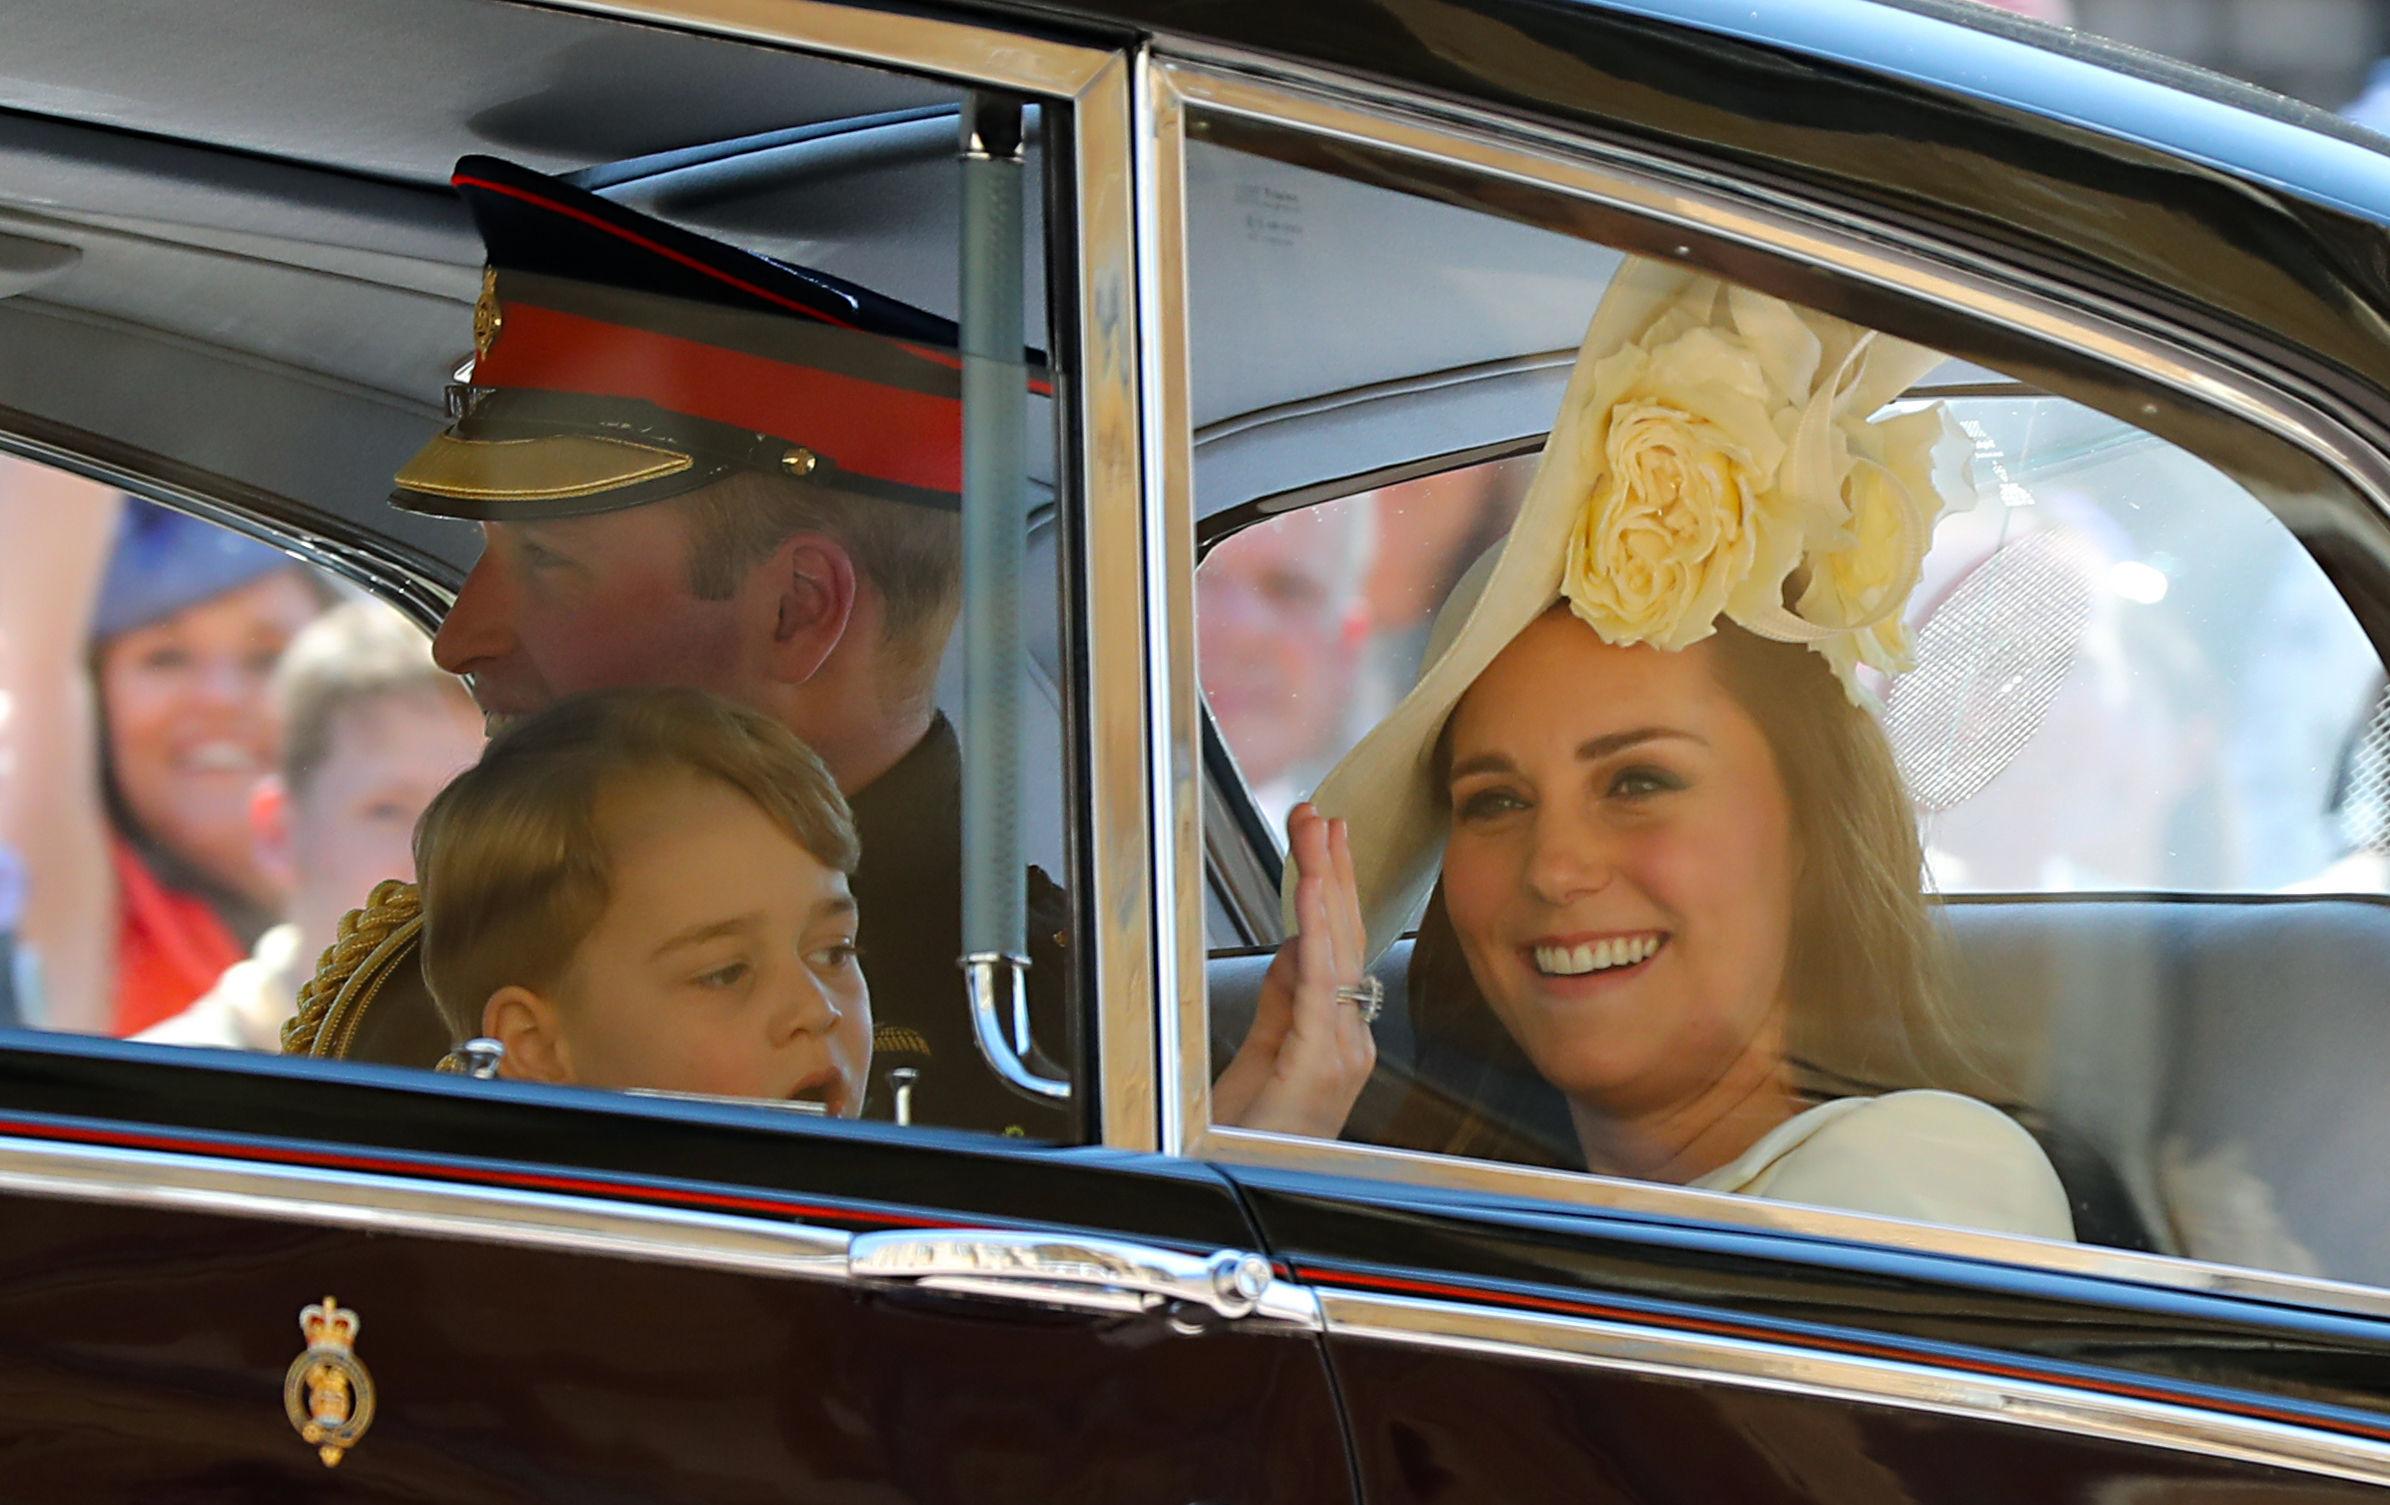 Príncipe William, príncipe George, princesa Kate